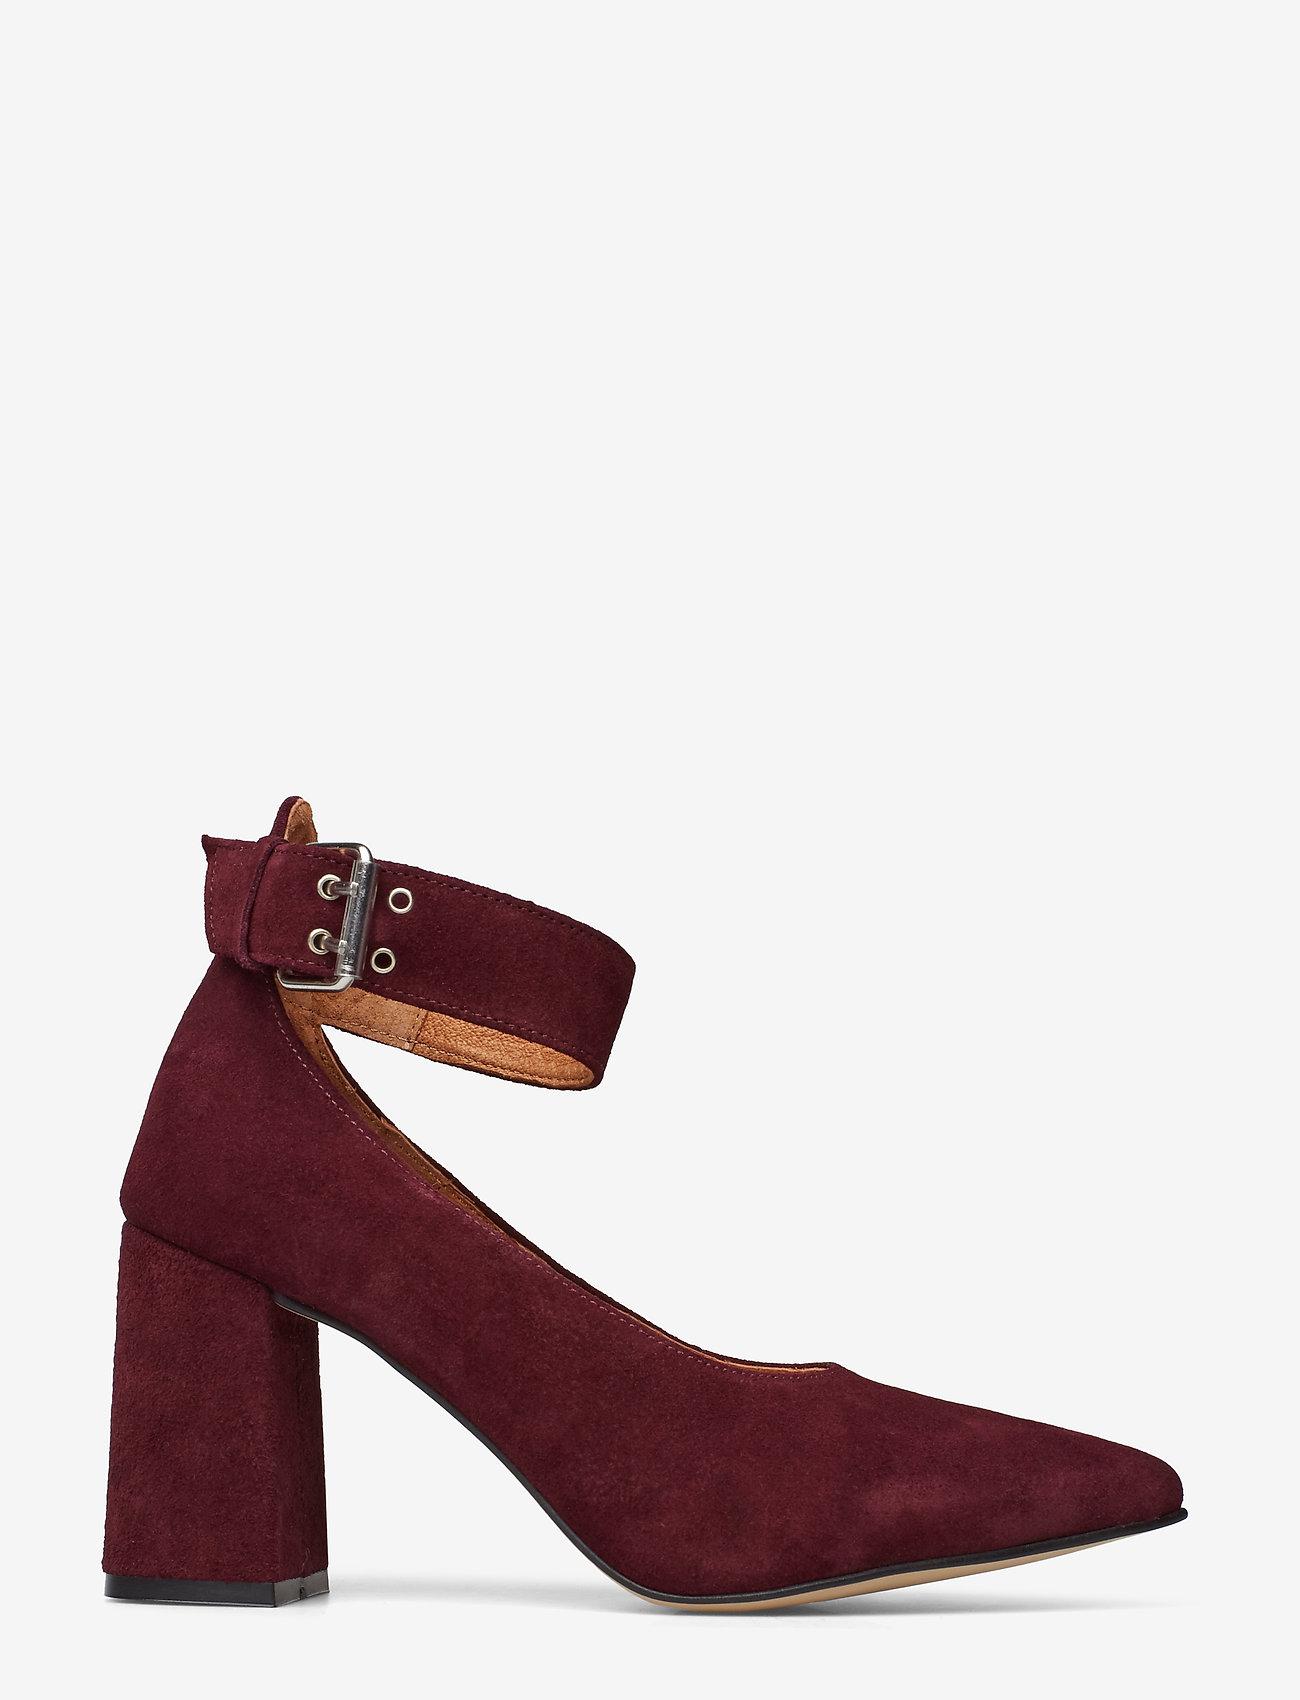 Shoe The Bear - JANE ANKLE S - klassiset piikkikorkokengät - burgundy